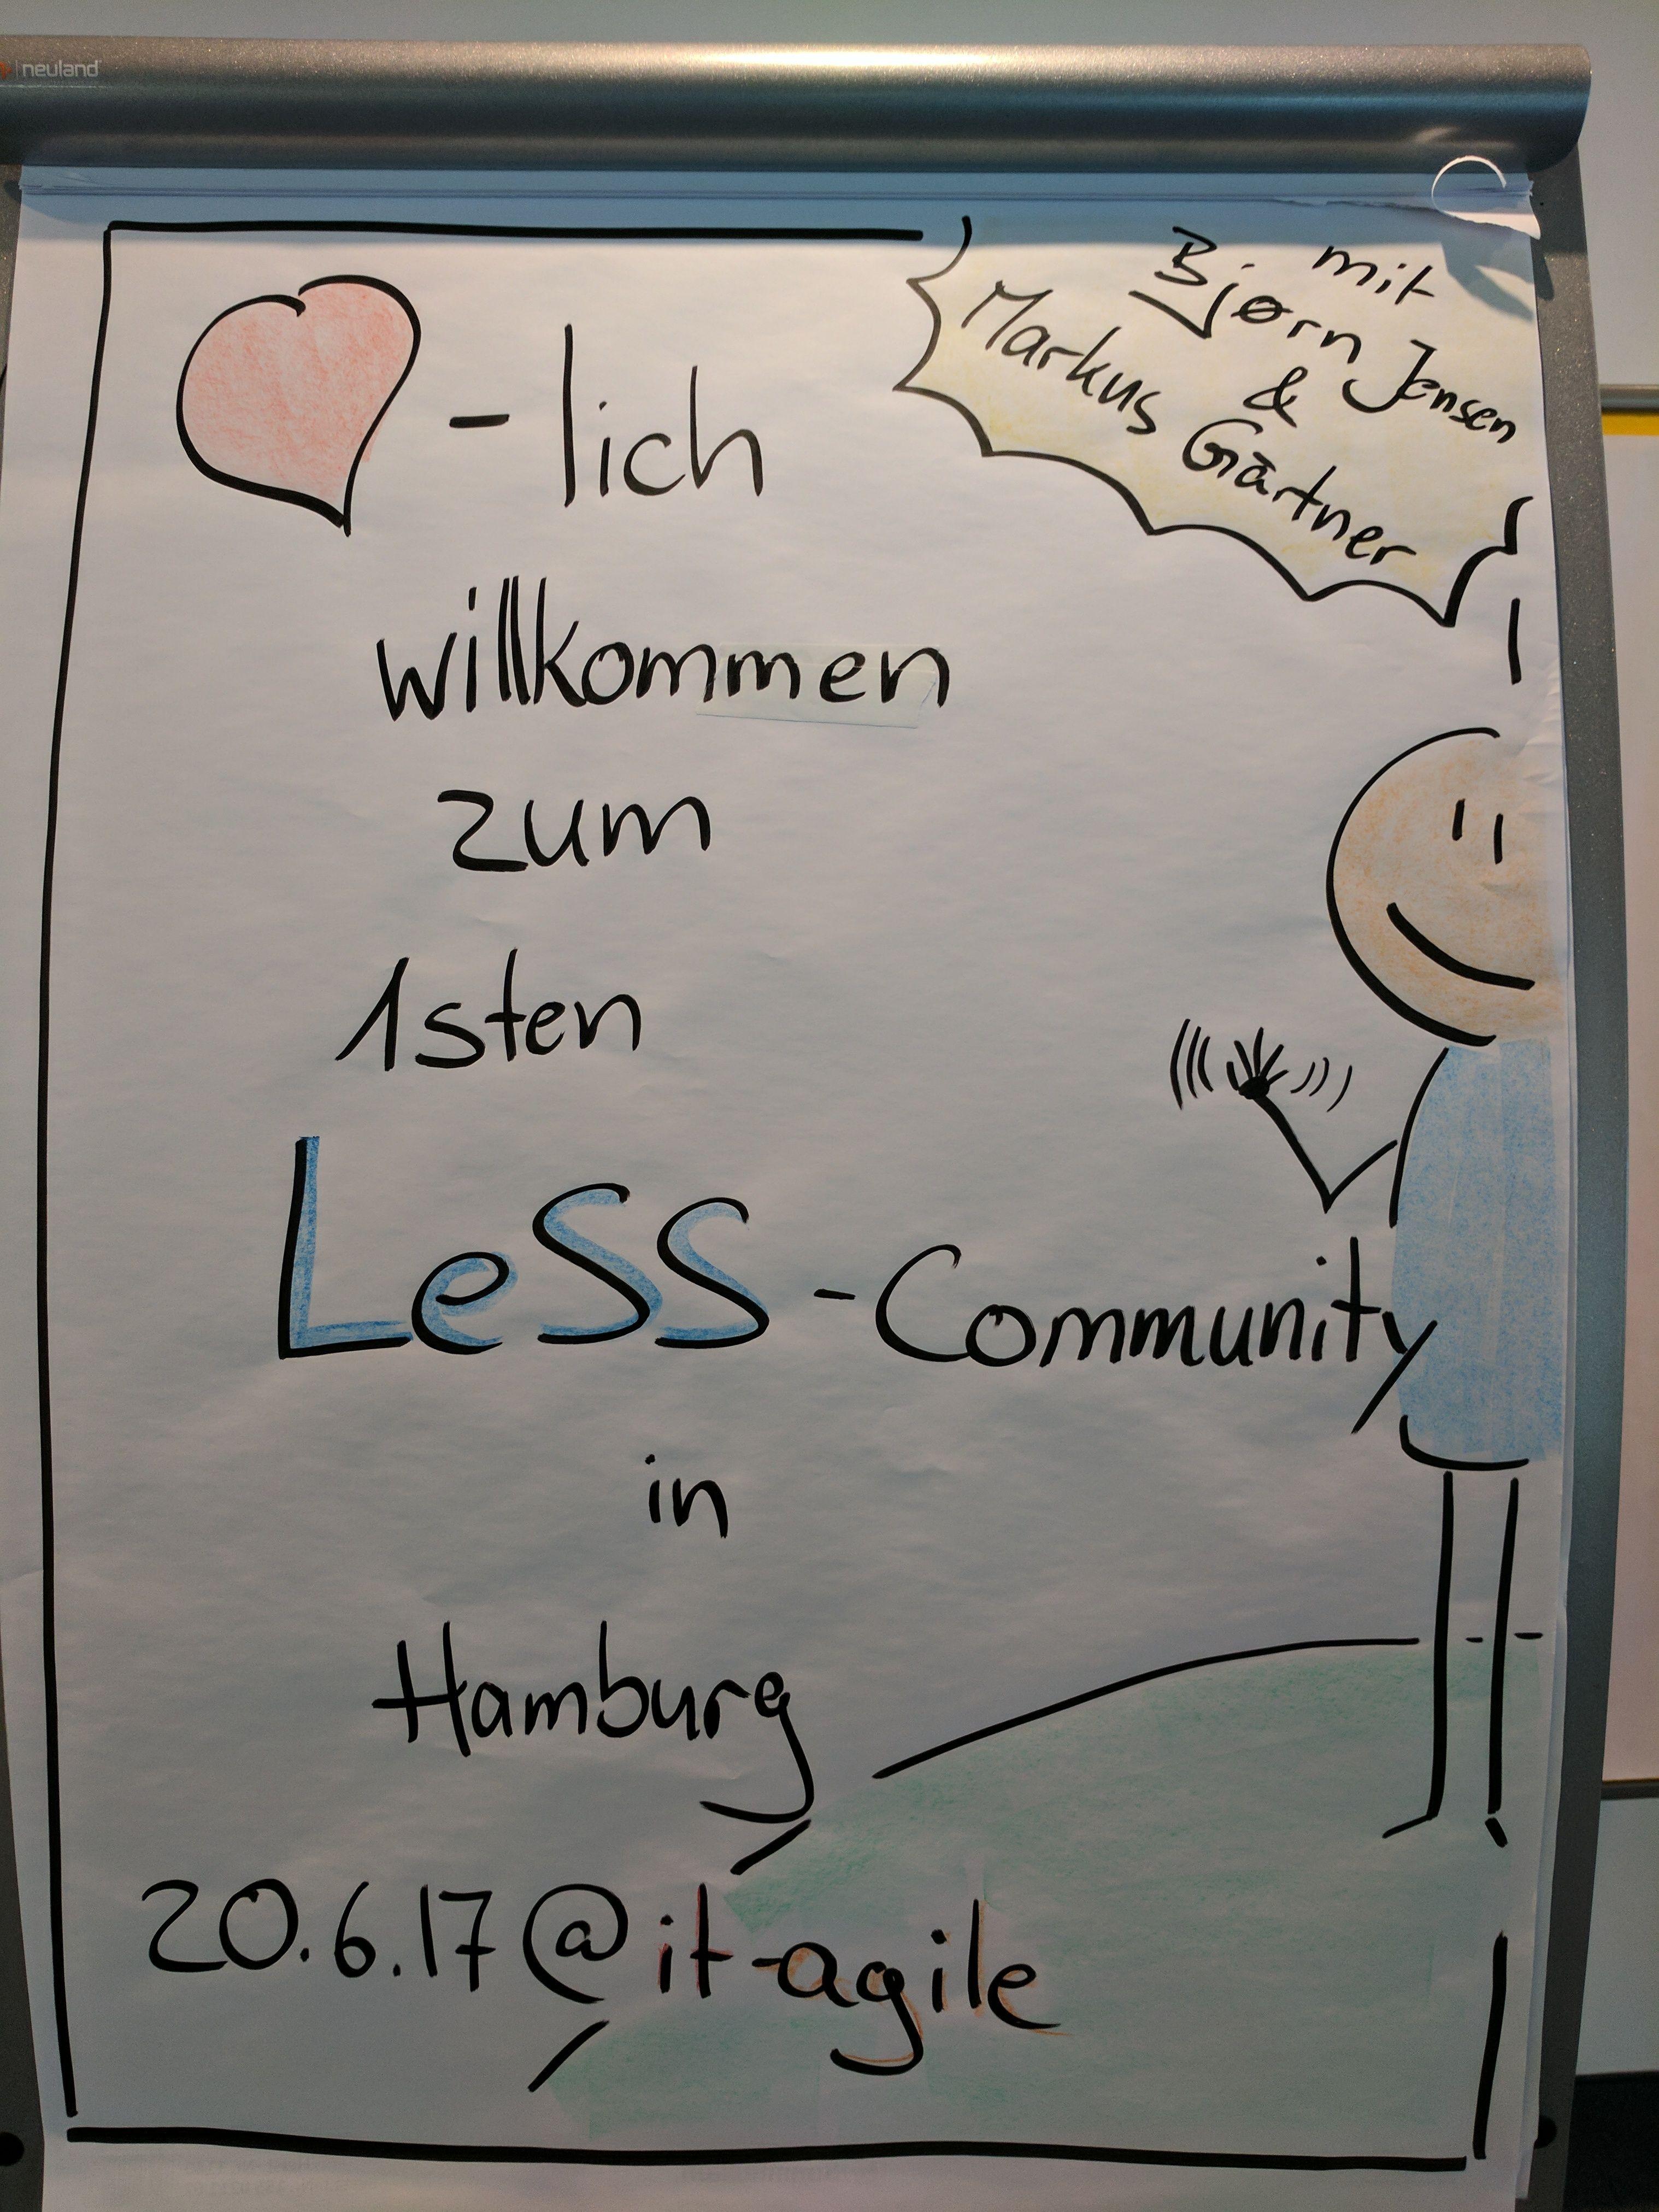 LeSS (Large-Scale Scrum) Hamburg